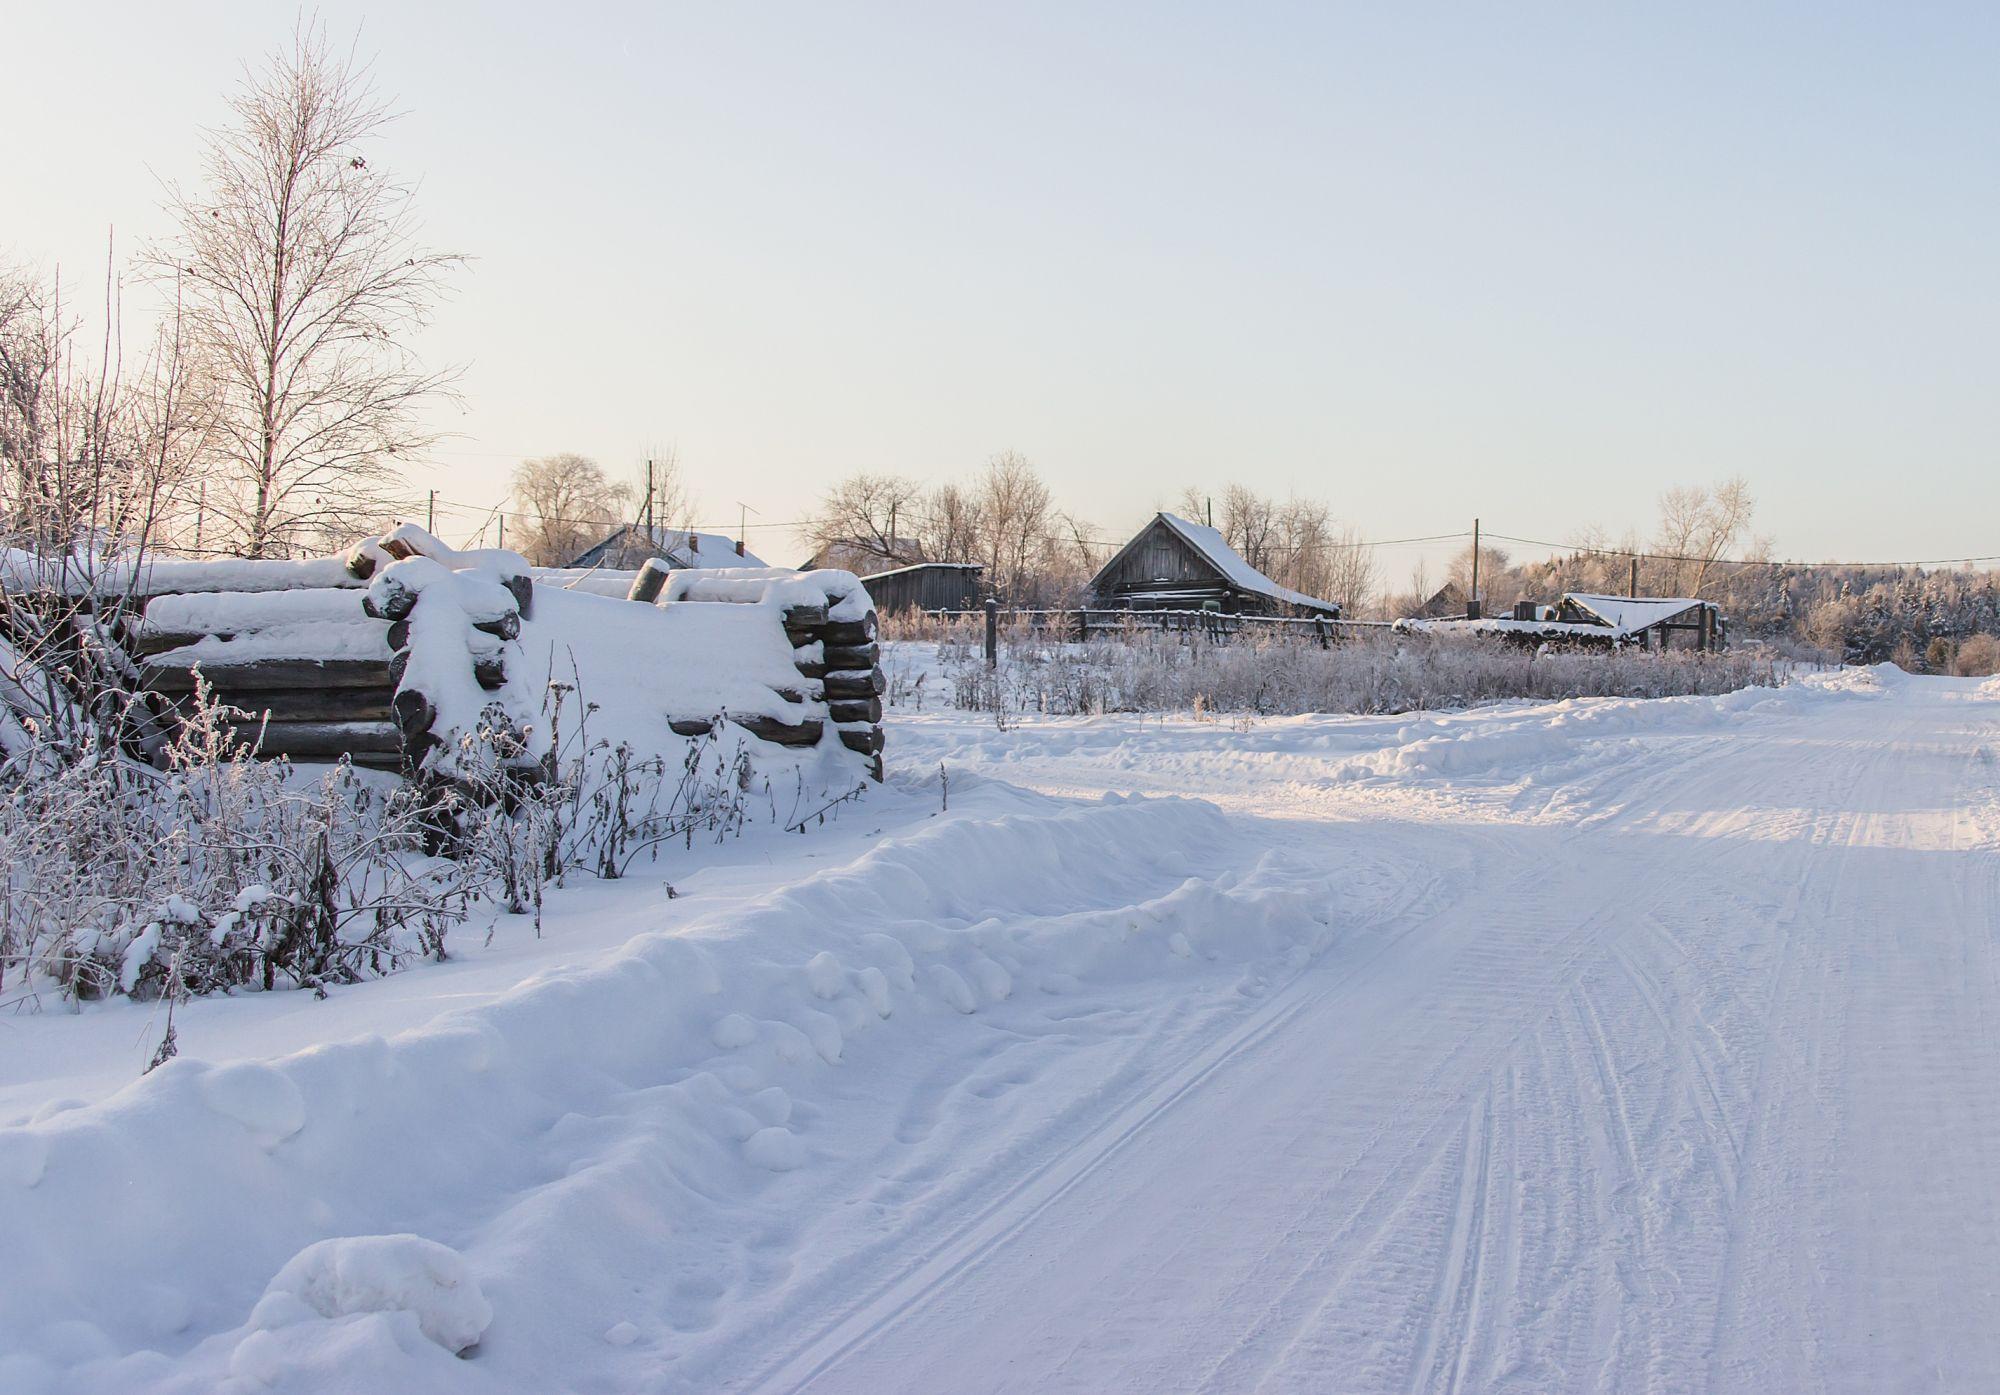 вот моя деревня фото деревьях отец